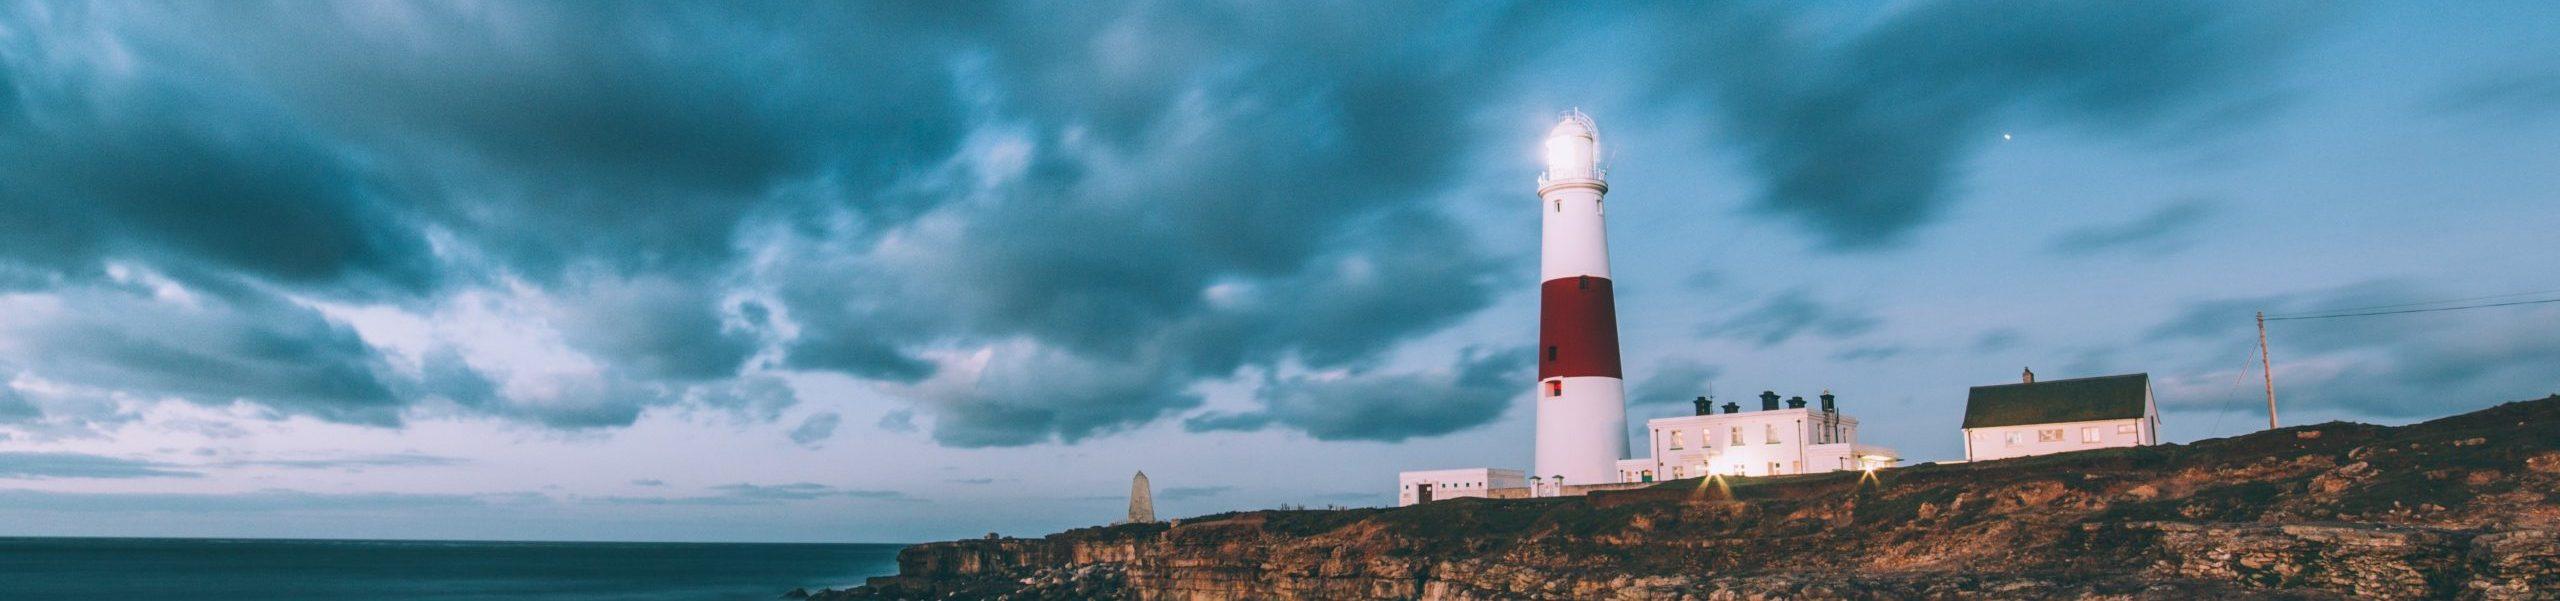 lighthouse-1246049